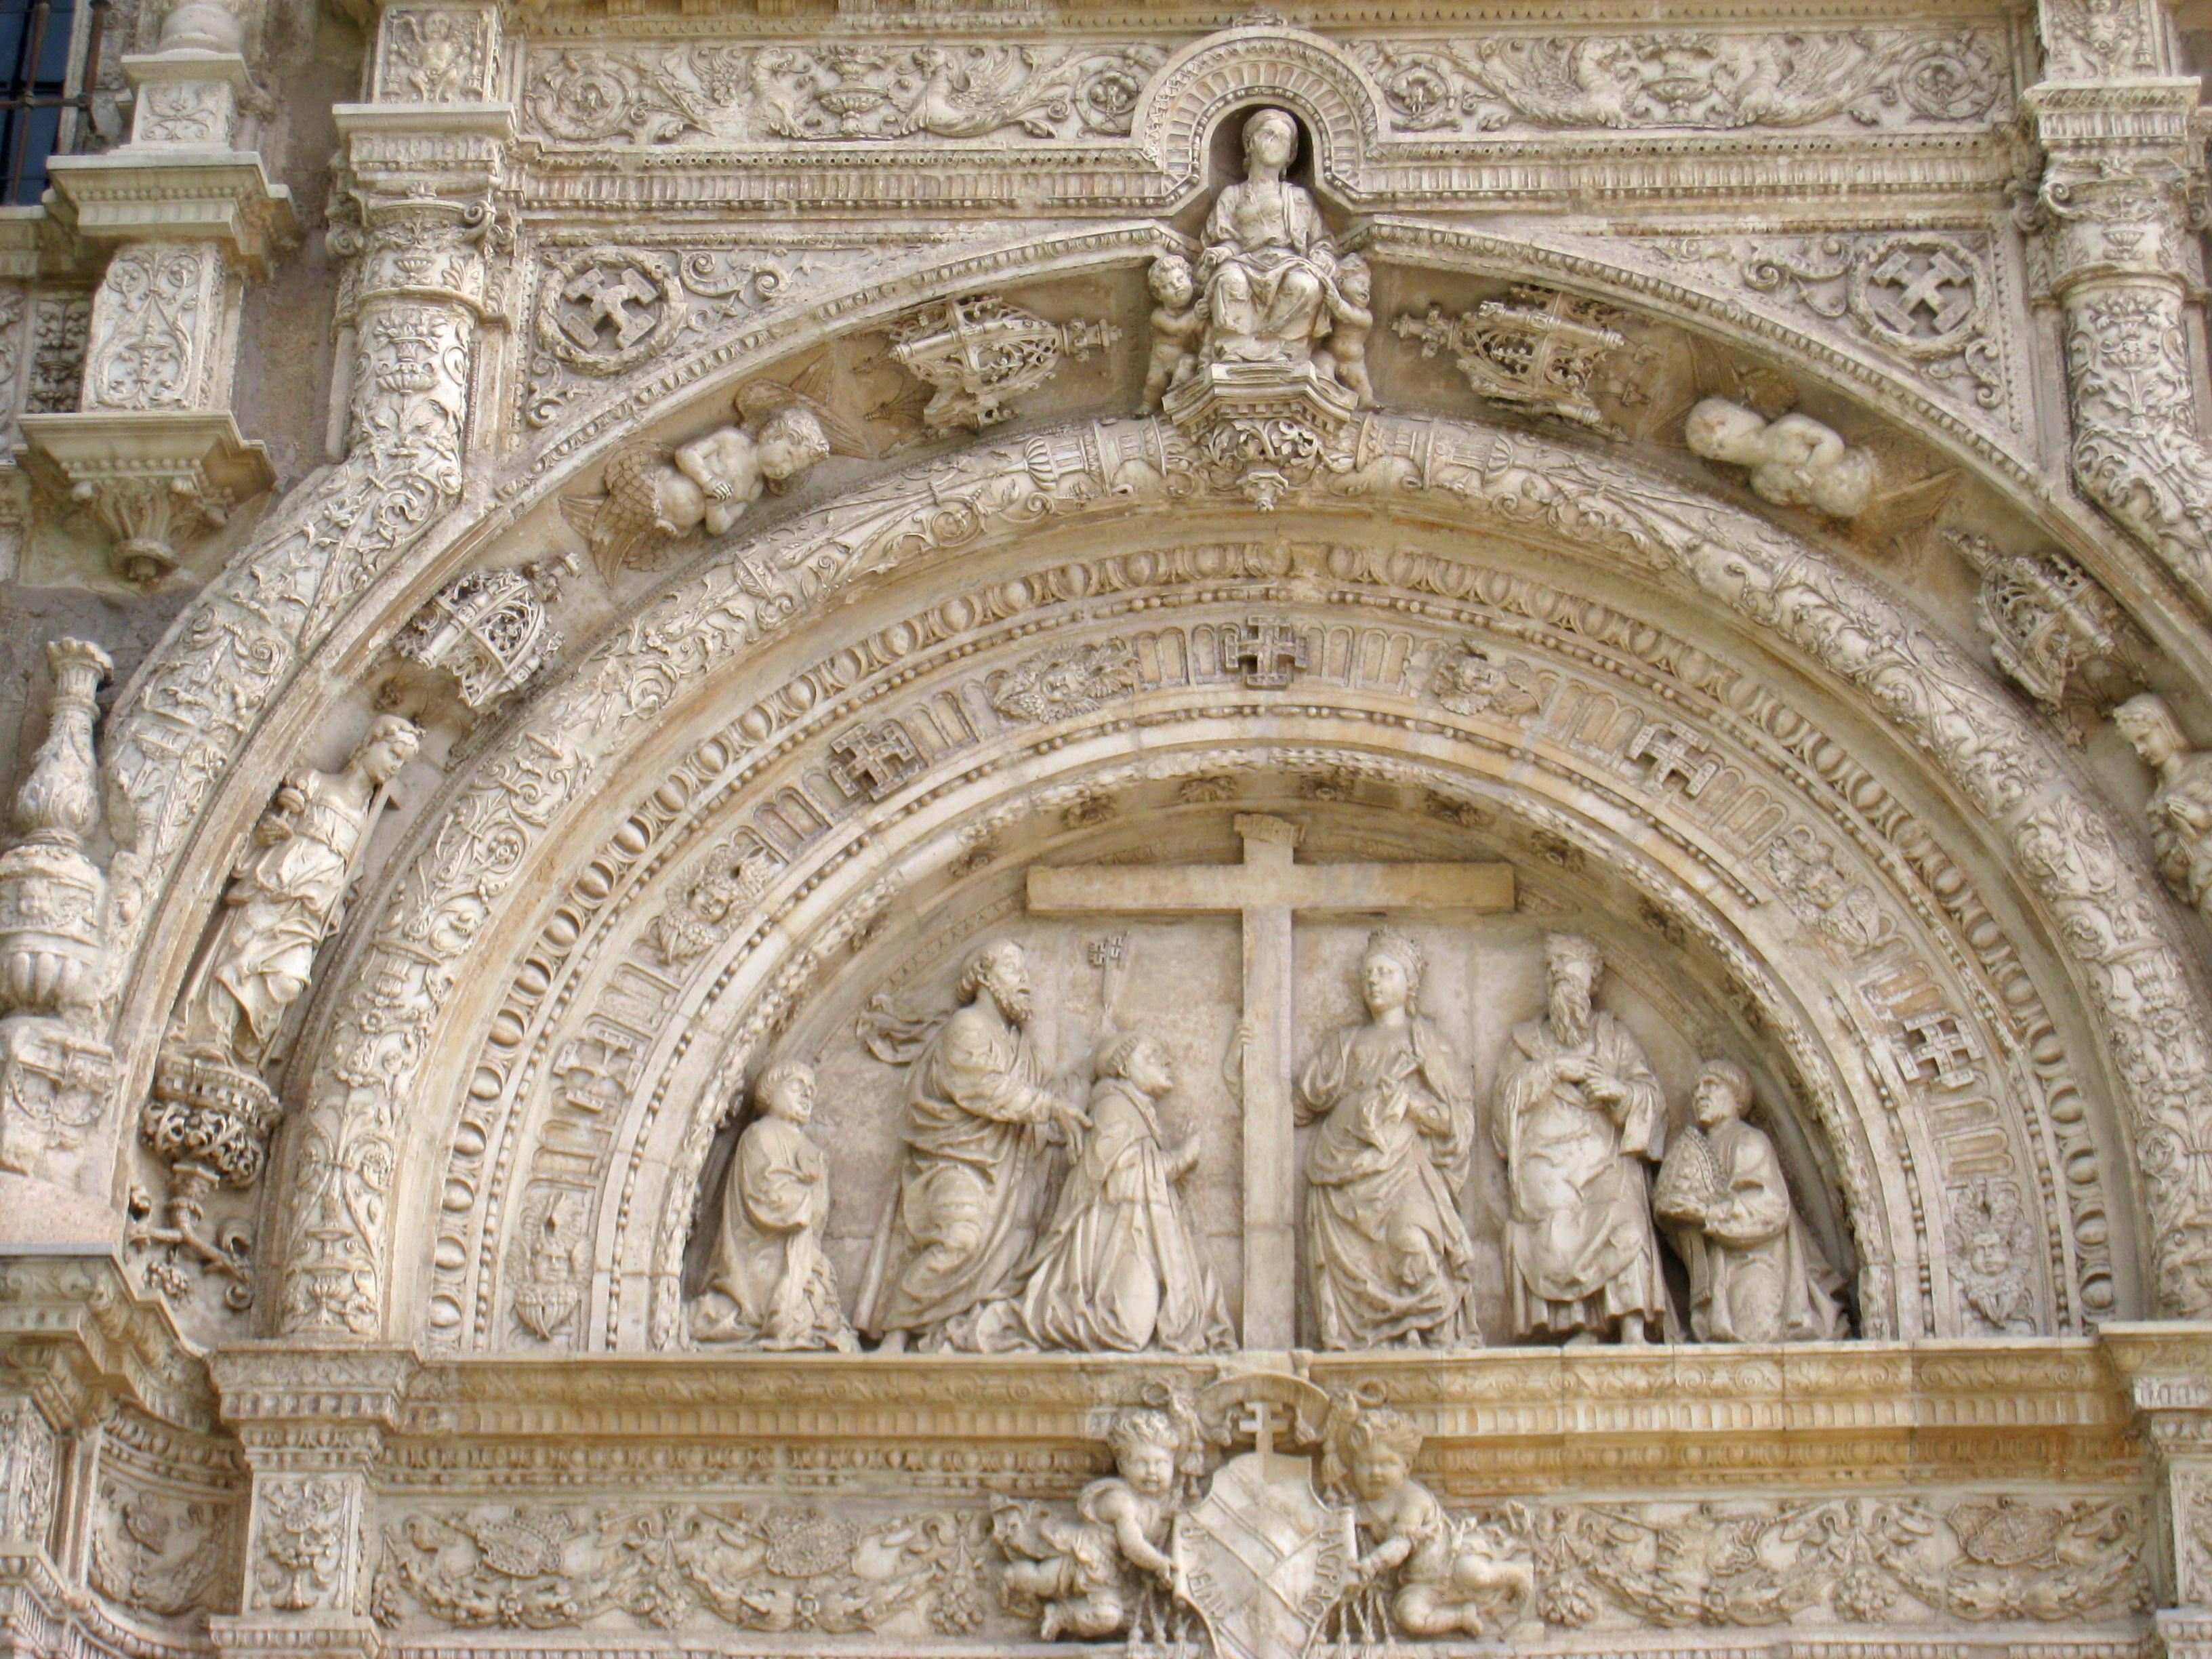 Museo De Santa Cruz.File Museo De Santa Cruz Toledo Detail 2 Jpg Wikimedia Commons